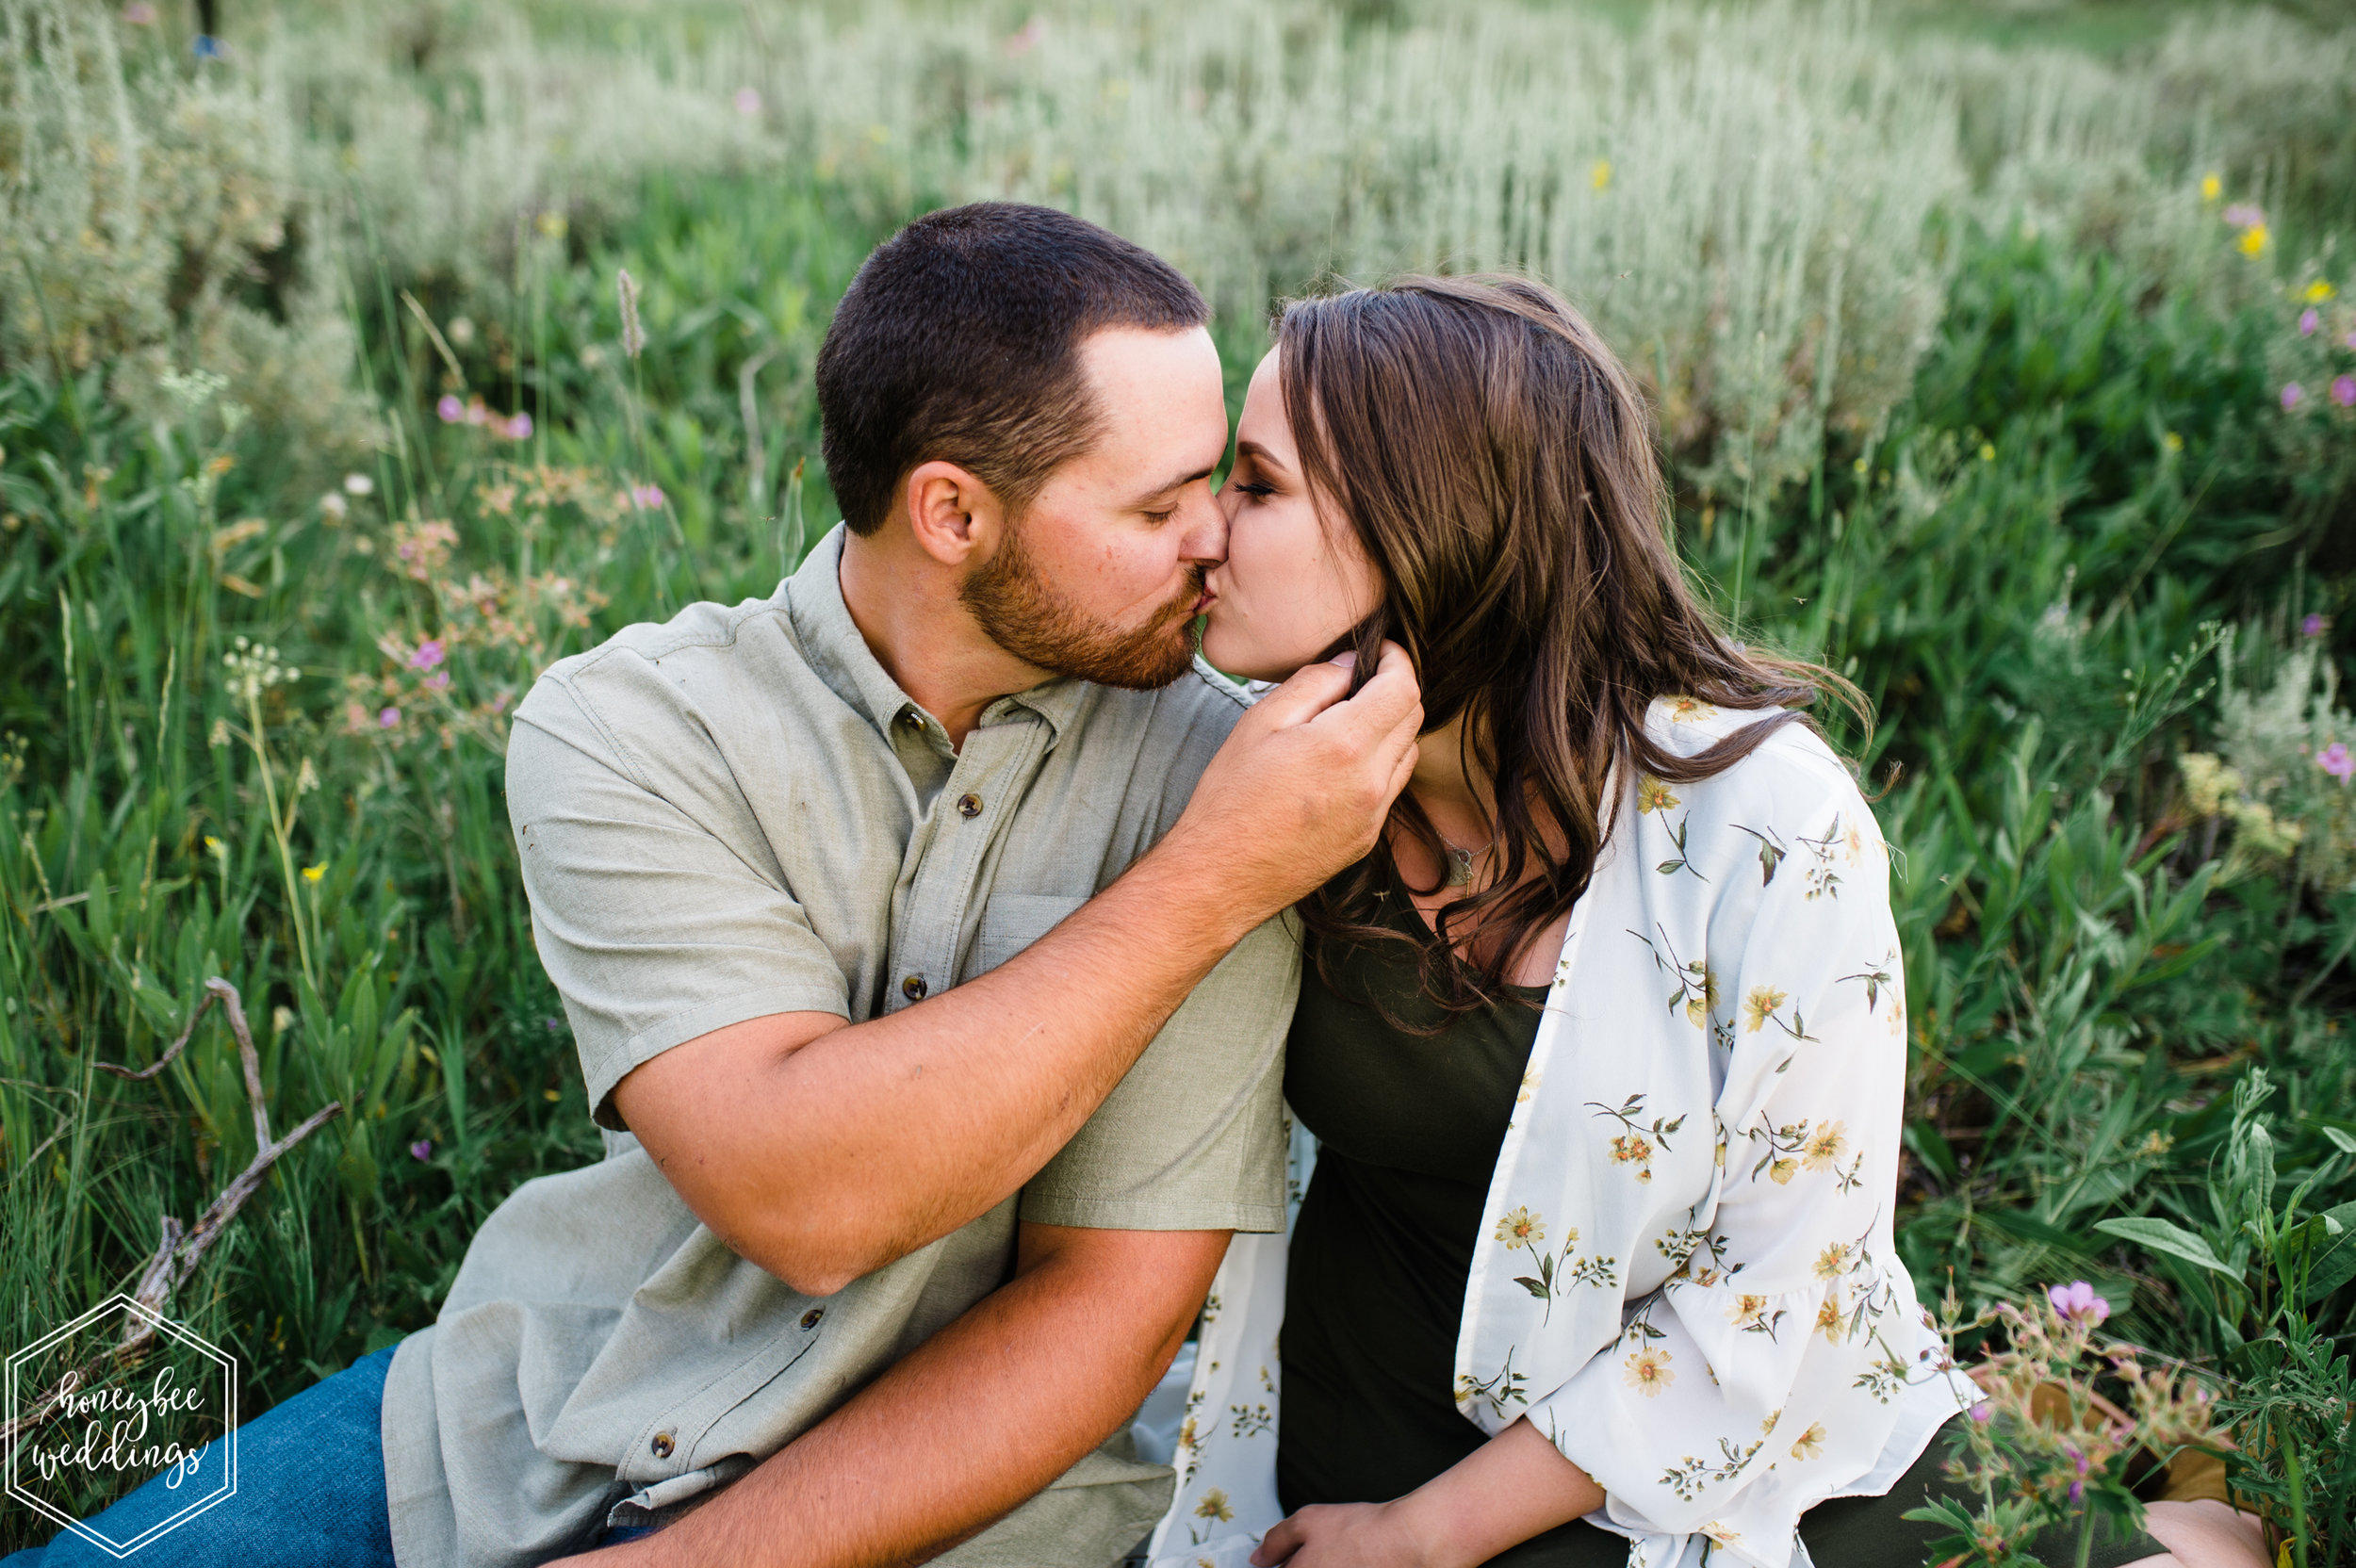 041Yellowstone National Park Wedding Photographer_Montana Engagement Session_Kelsie & DJ_July 24, 2019-406.jpg